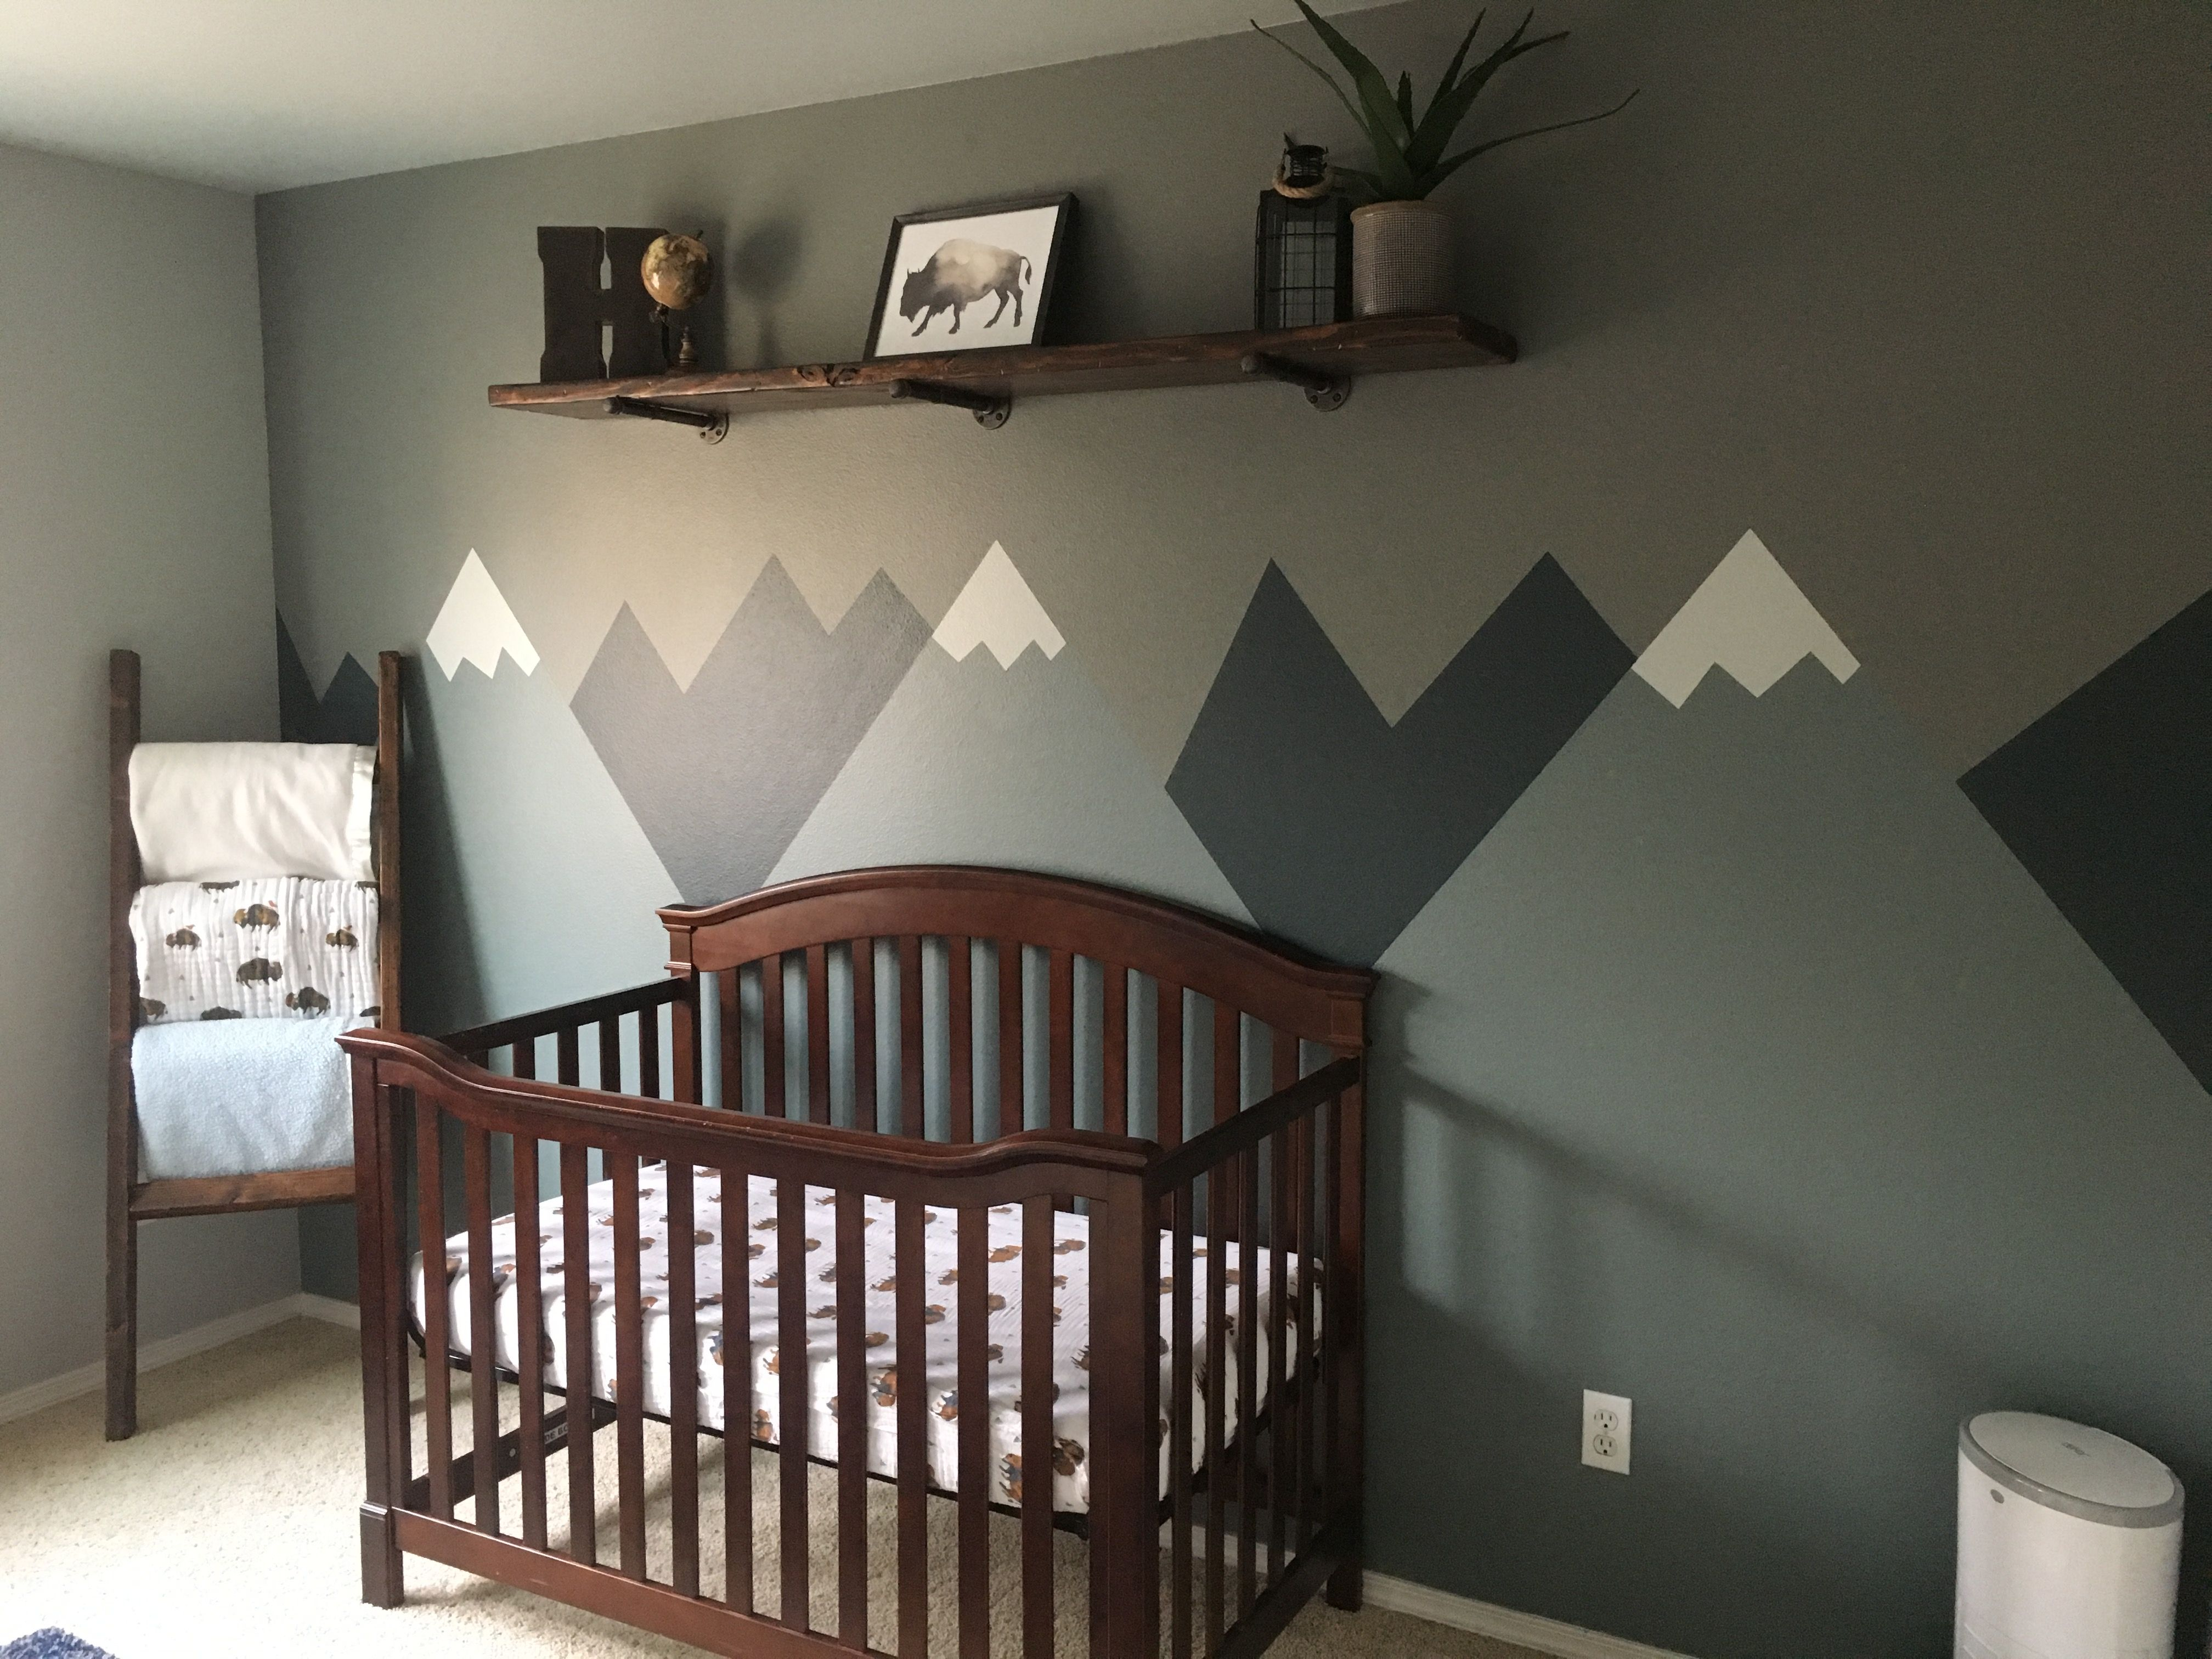 Baby Boy Outdoor Mountain Nursery Baby Room Mountains Buffalo Baby Room Colors Baby Boy Room Decor Boys Bedroom Ideas Outdoors